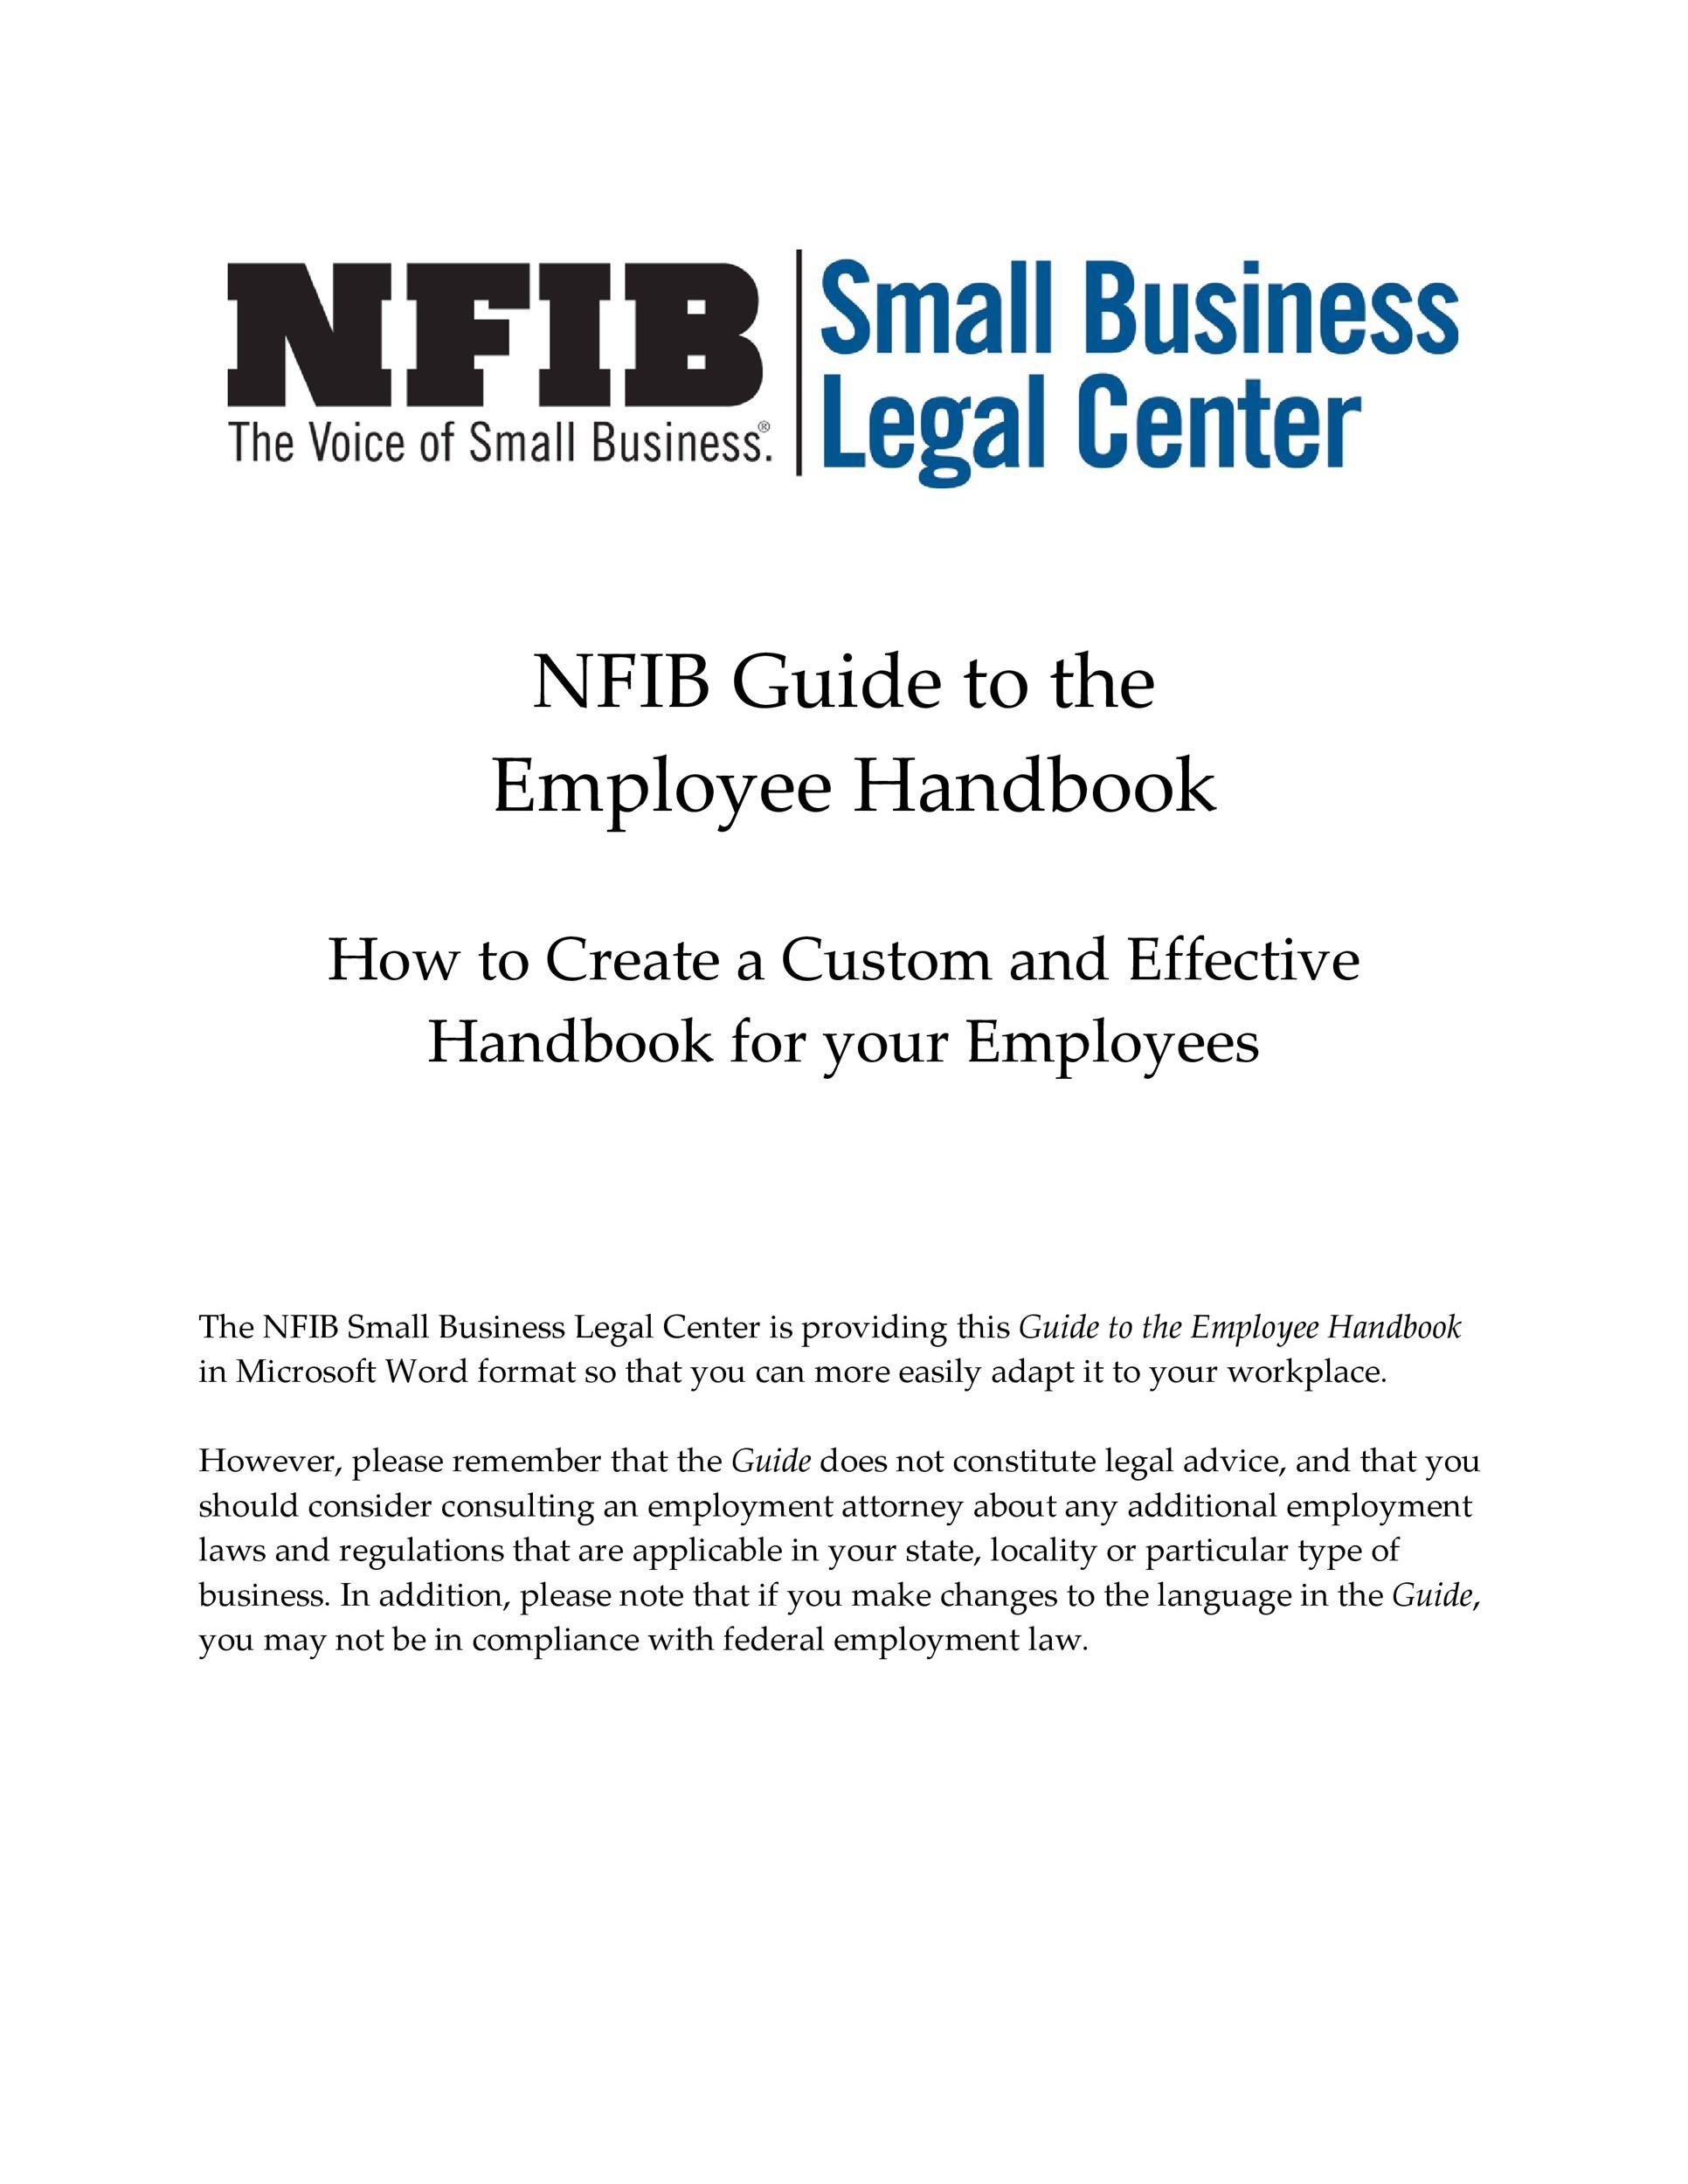 Free employee handbook template 01